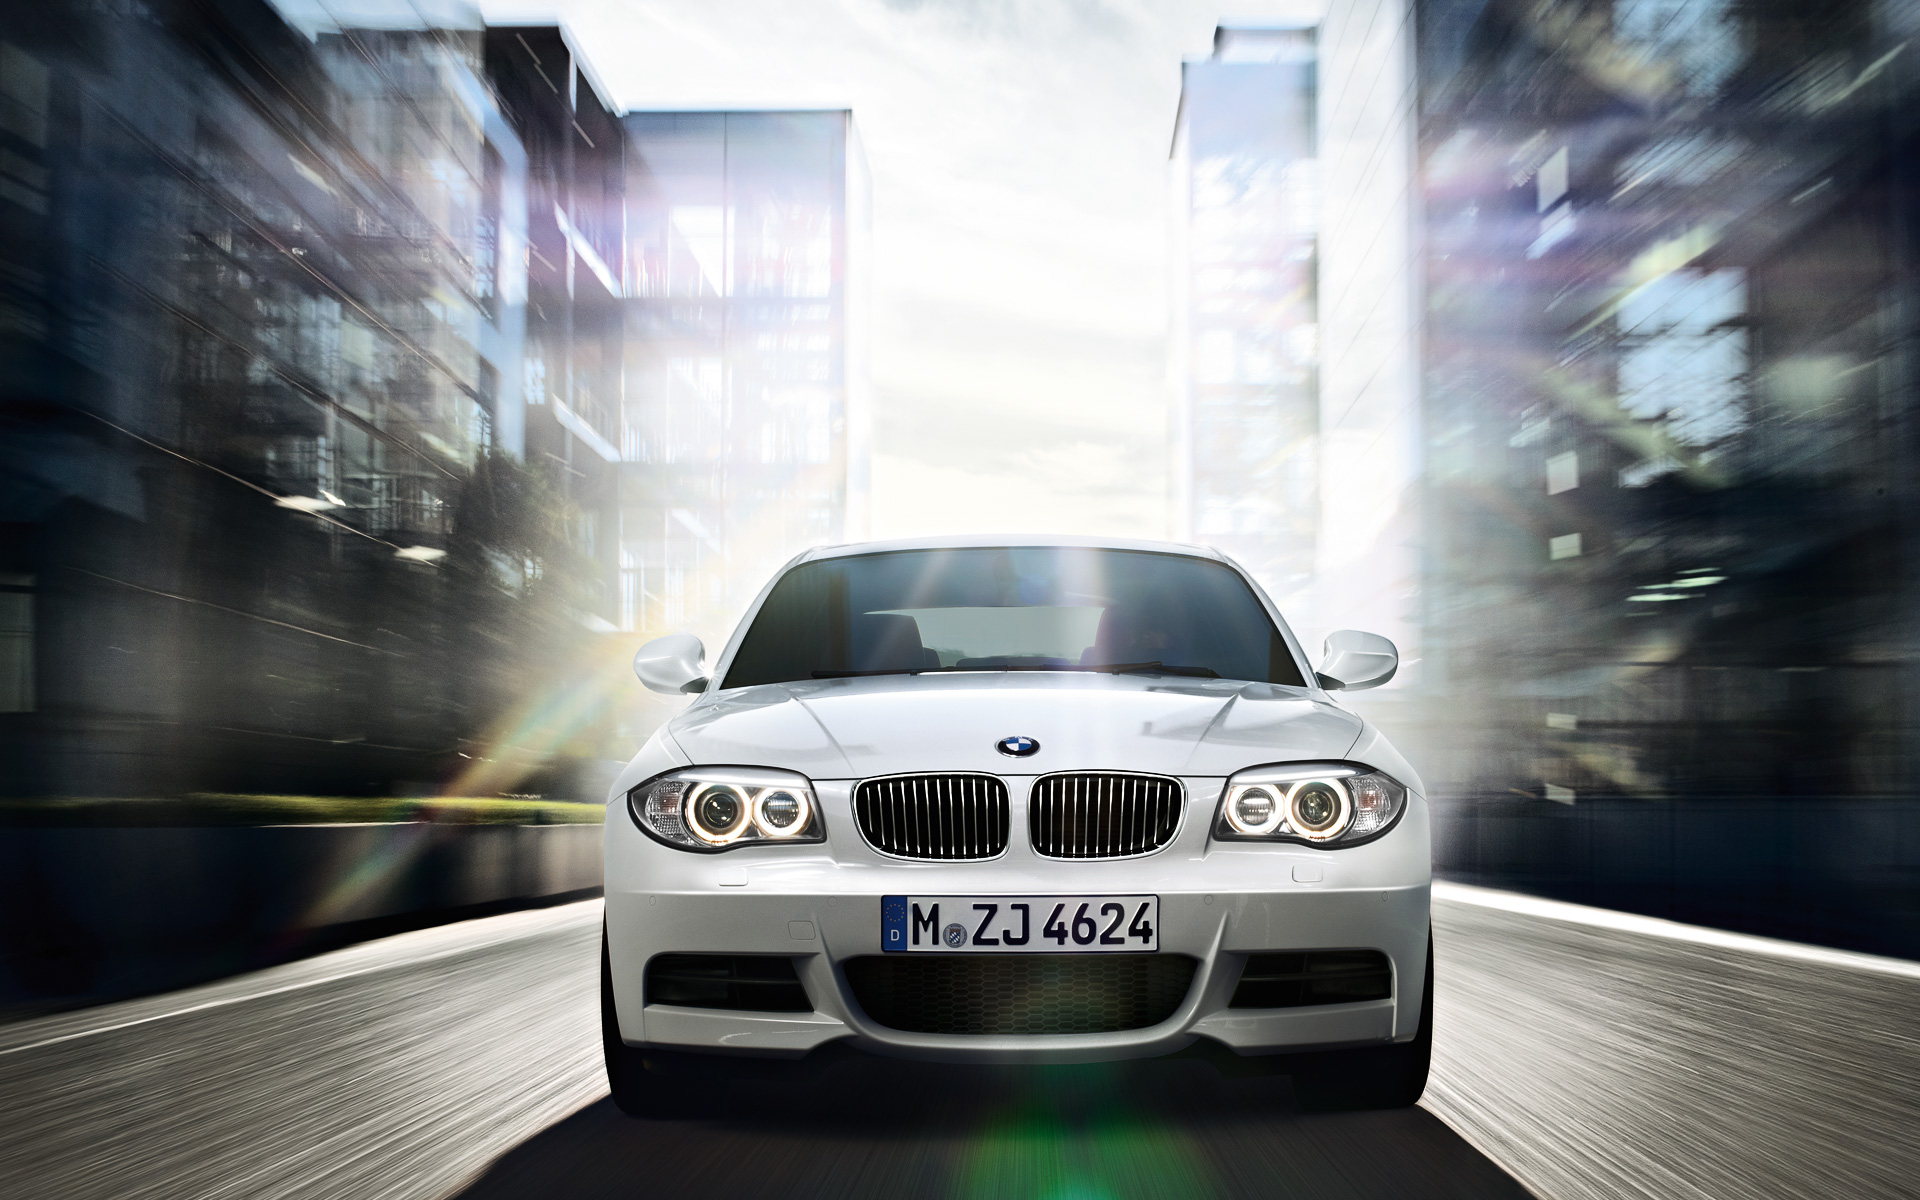 Free download BMW 1 Series Convertible 3 Wallpaper HD Car ...